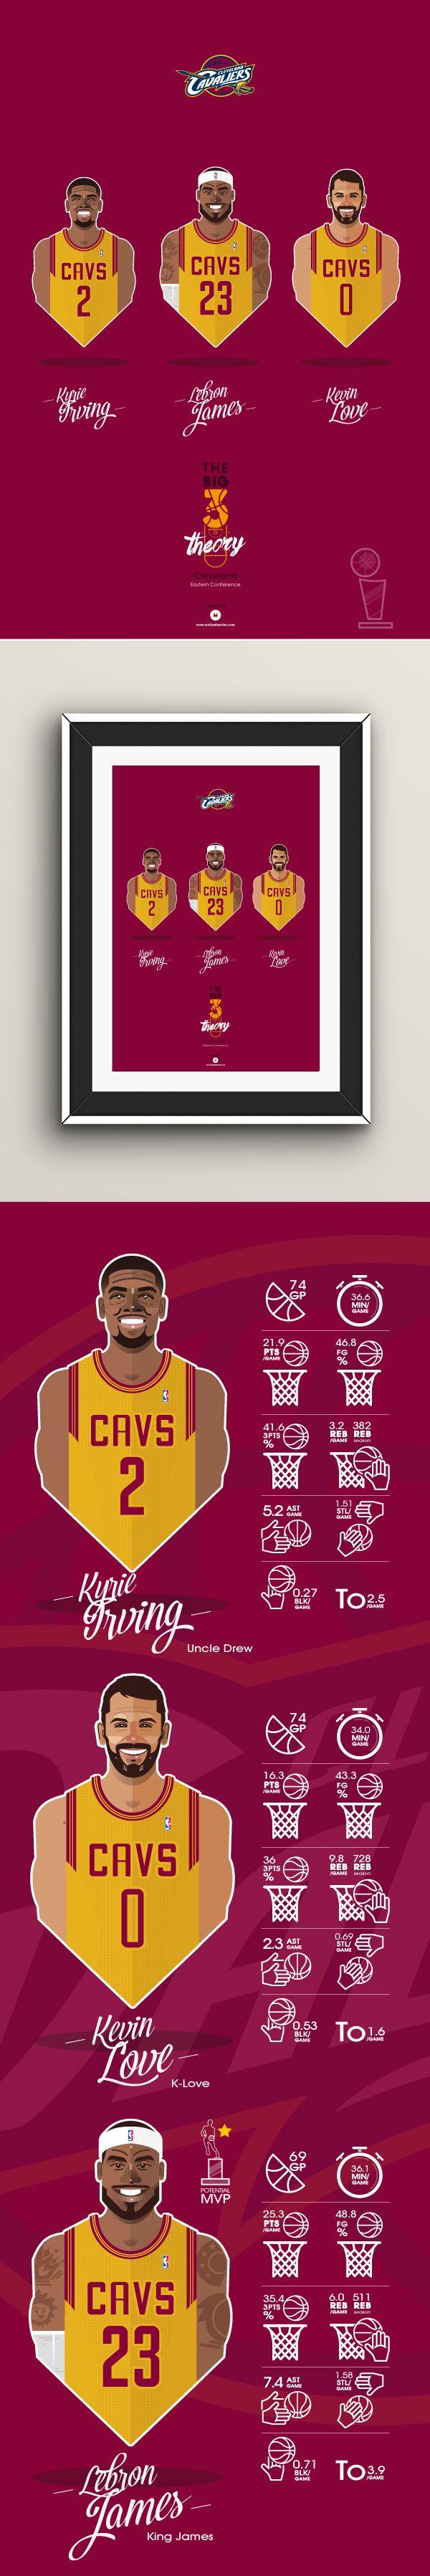 Big 3 / Eastern Conference / NBA on Behance